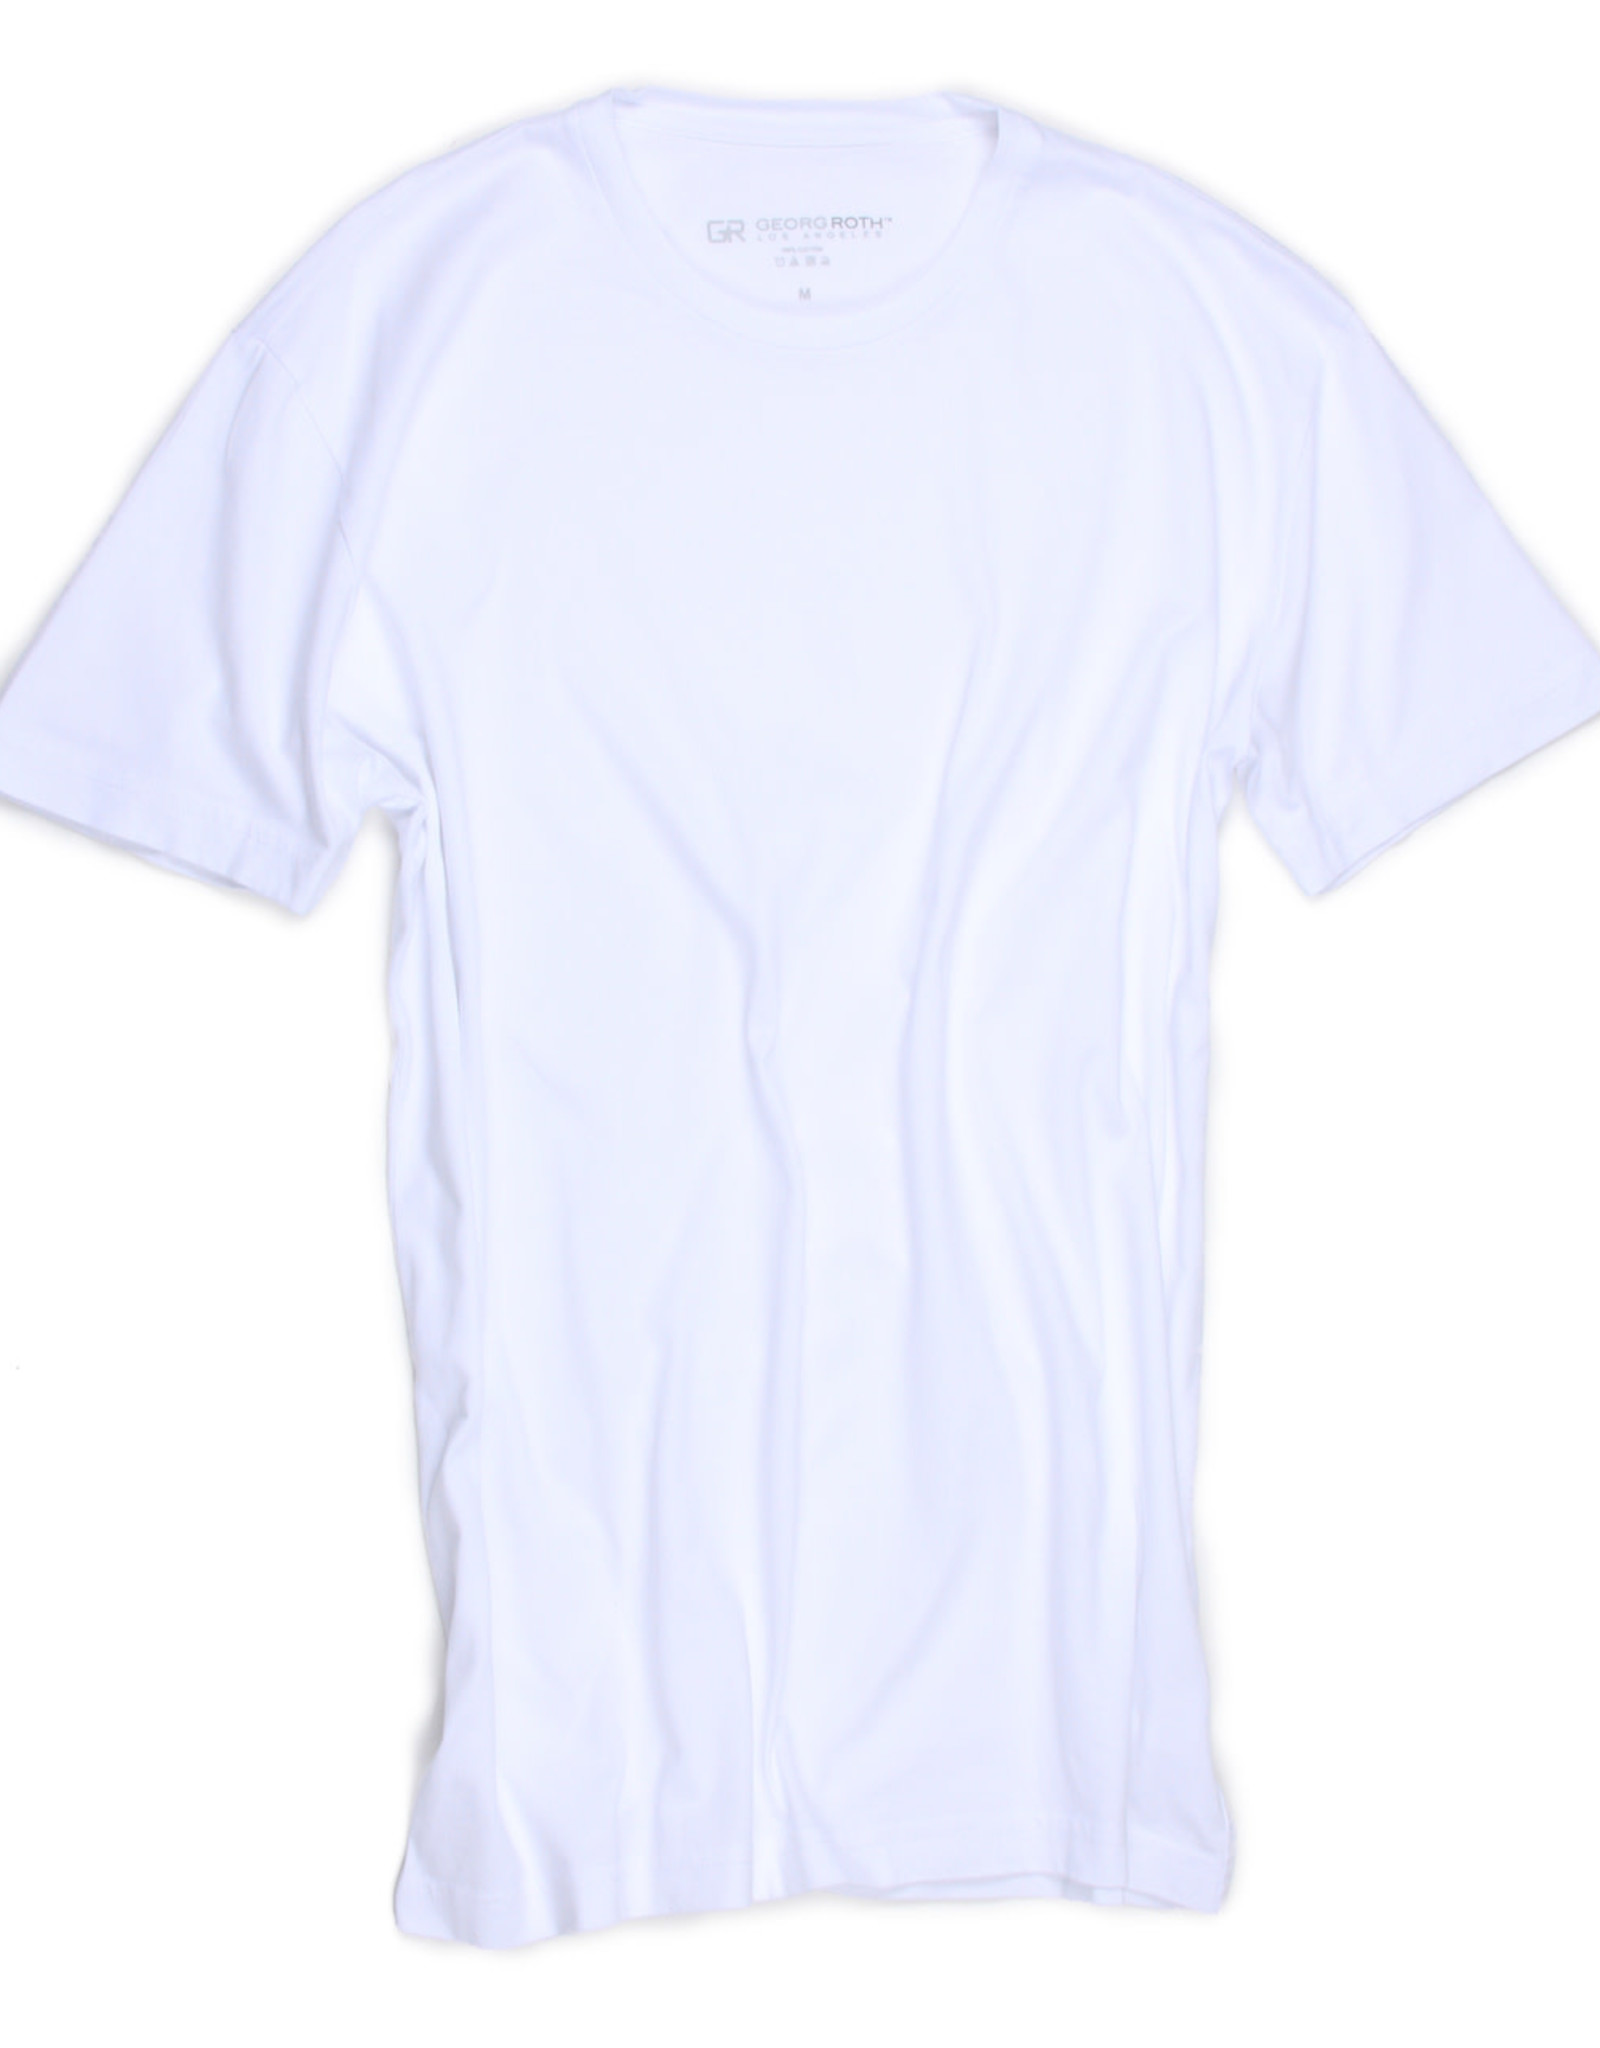 Georg Roth Luxury Pima Crew Neck Short Sleeves T-Shirt